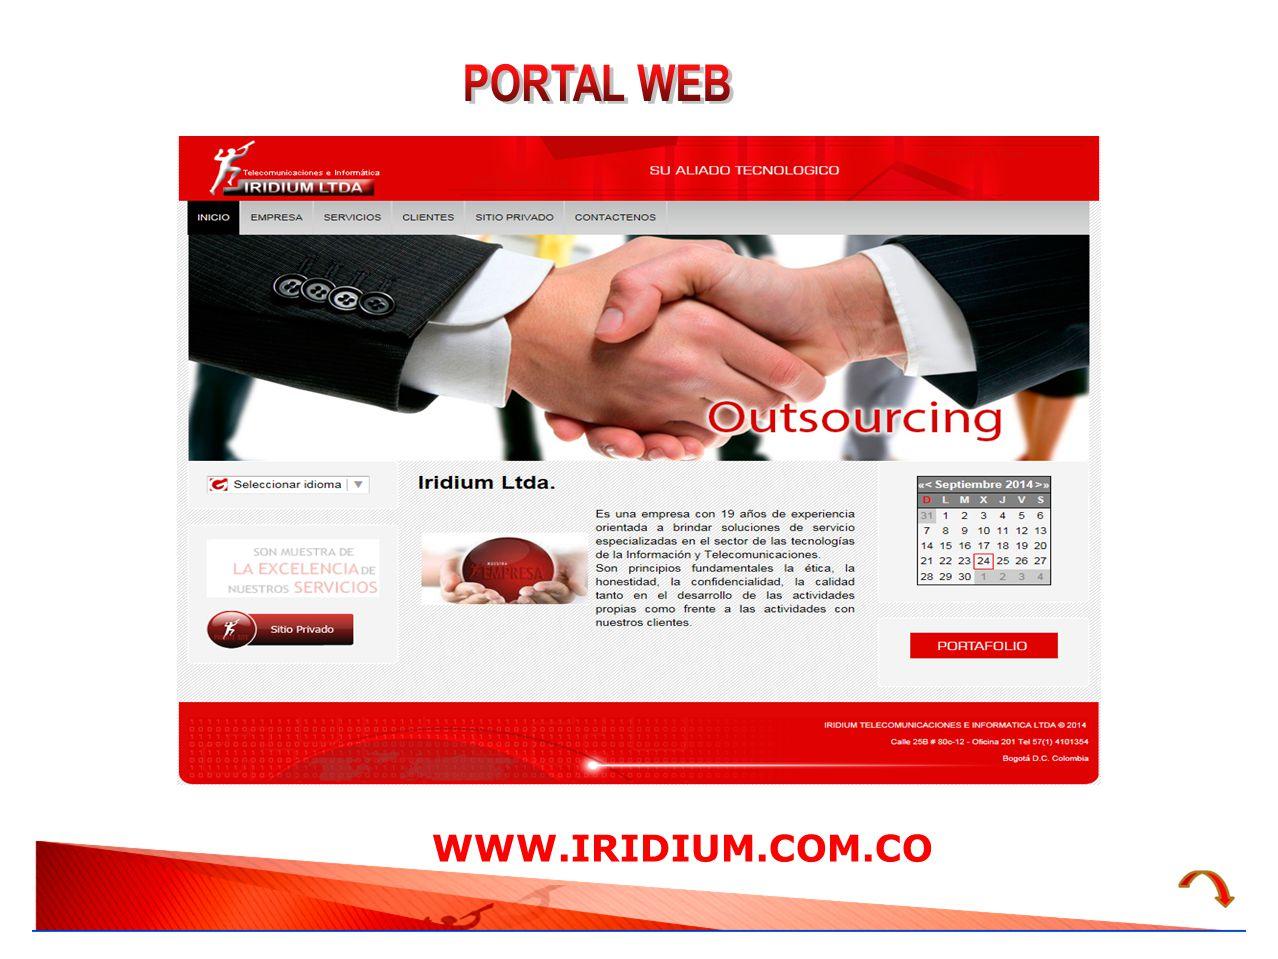 PORTAL WEB WWW.IRIDIUM.COM.CO